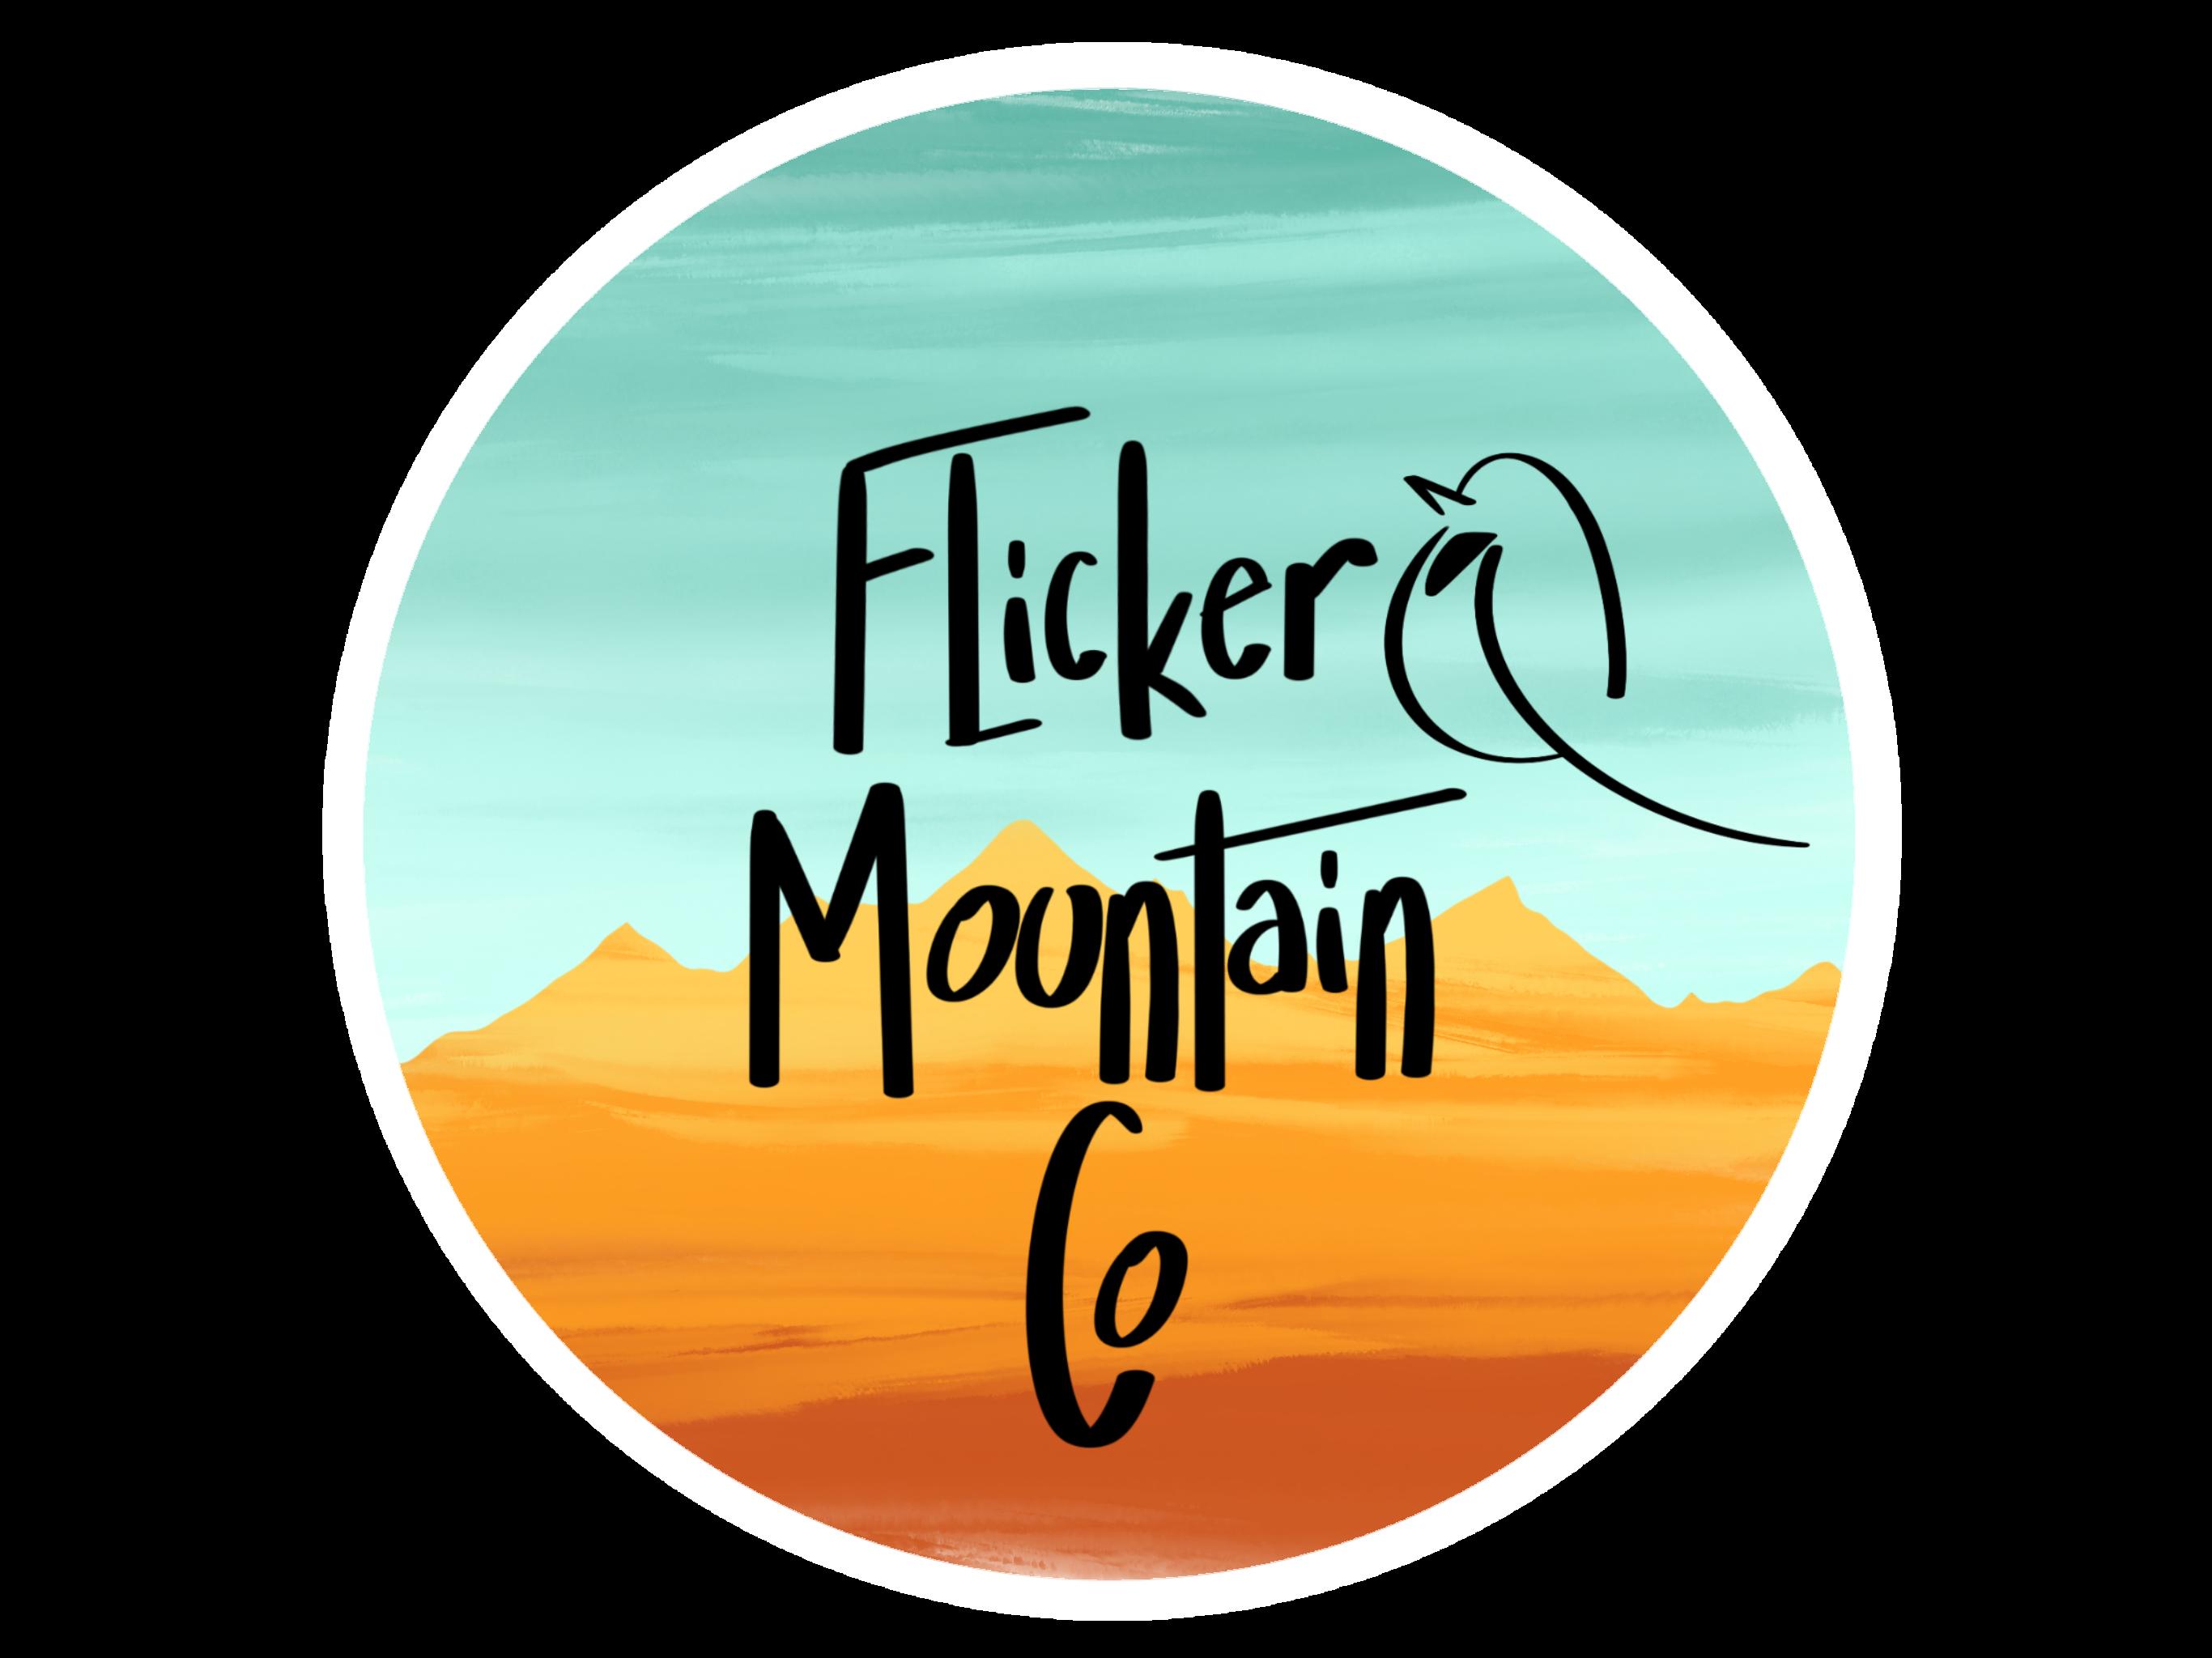 Flicker Mountain Co.